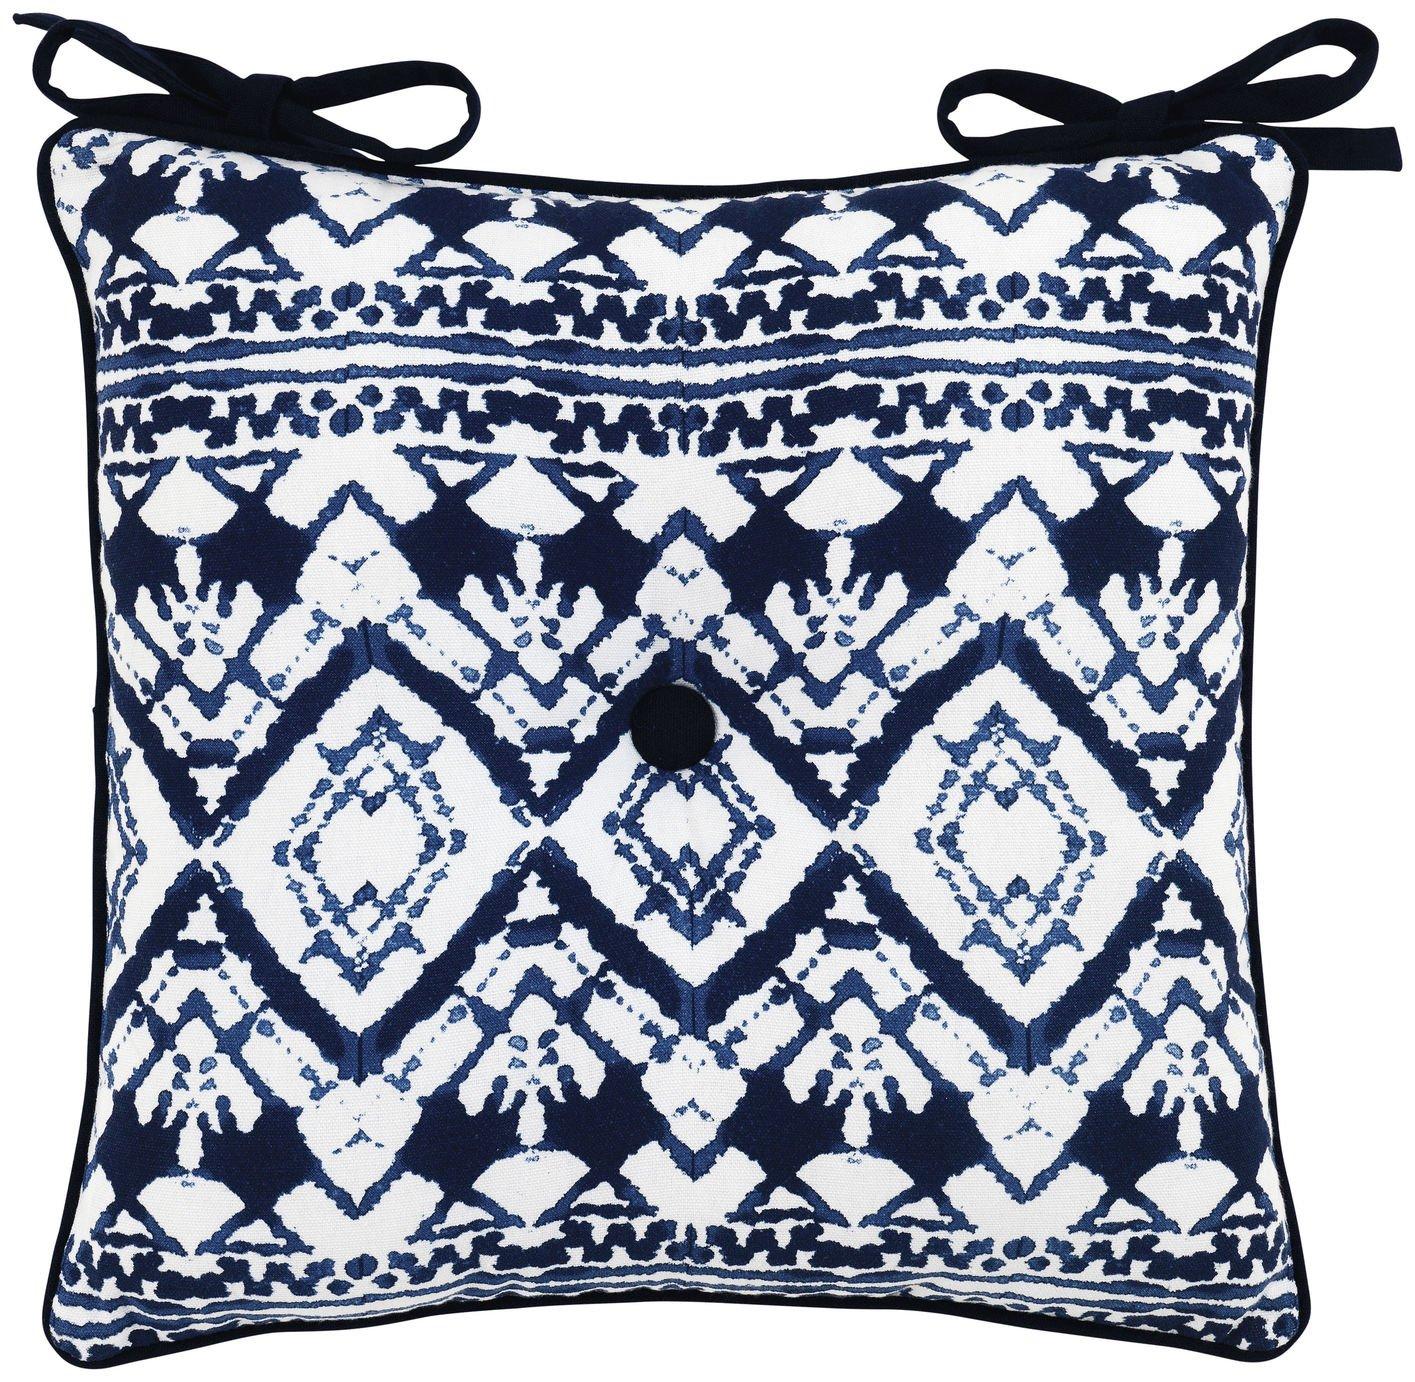 Image of Sainsbury's Home Shibori Seat Cushion - Blue